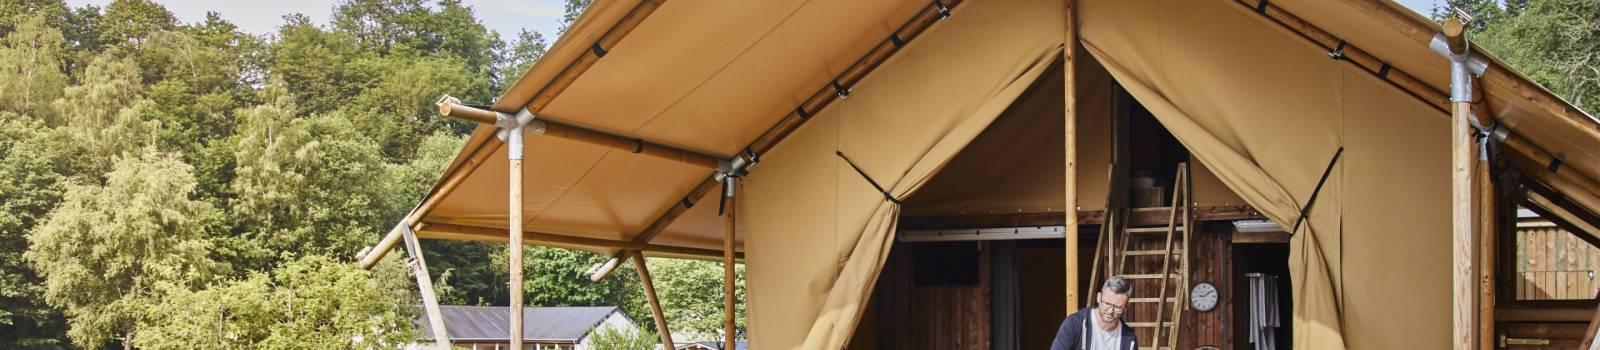 camping kaul 2019 009